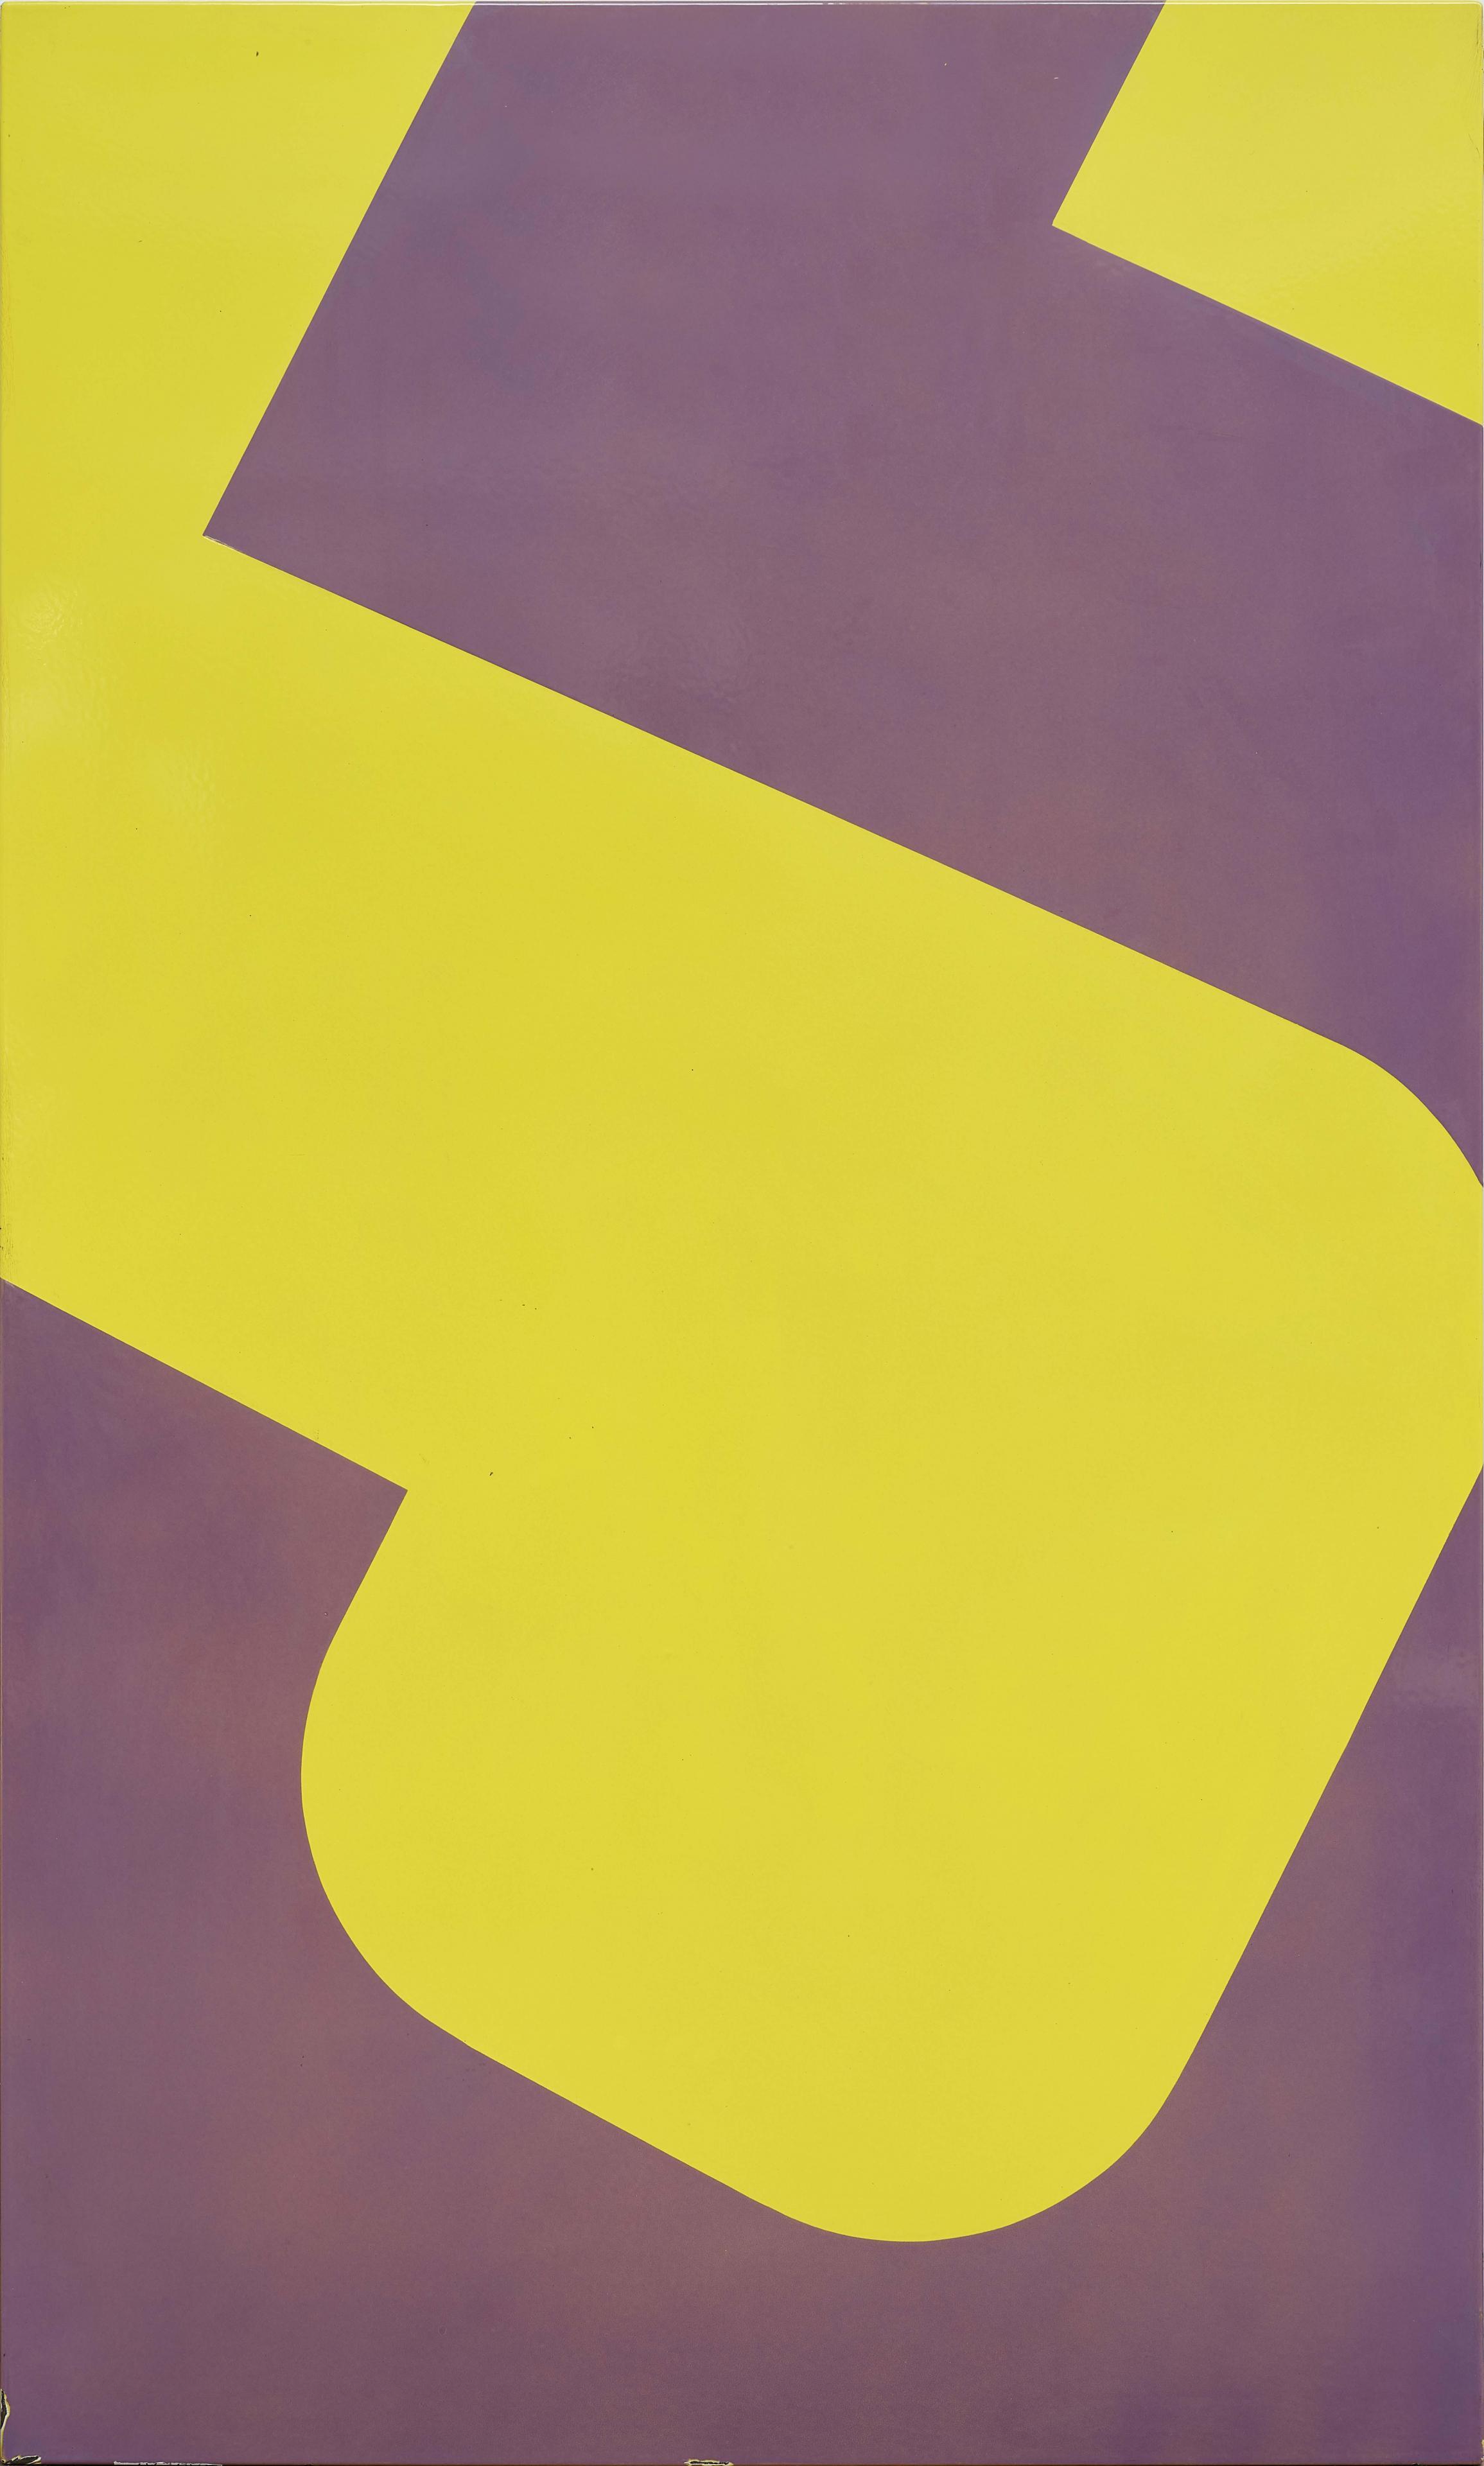 Aubergine/Yellow/Diagonal/Five